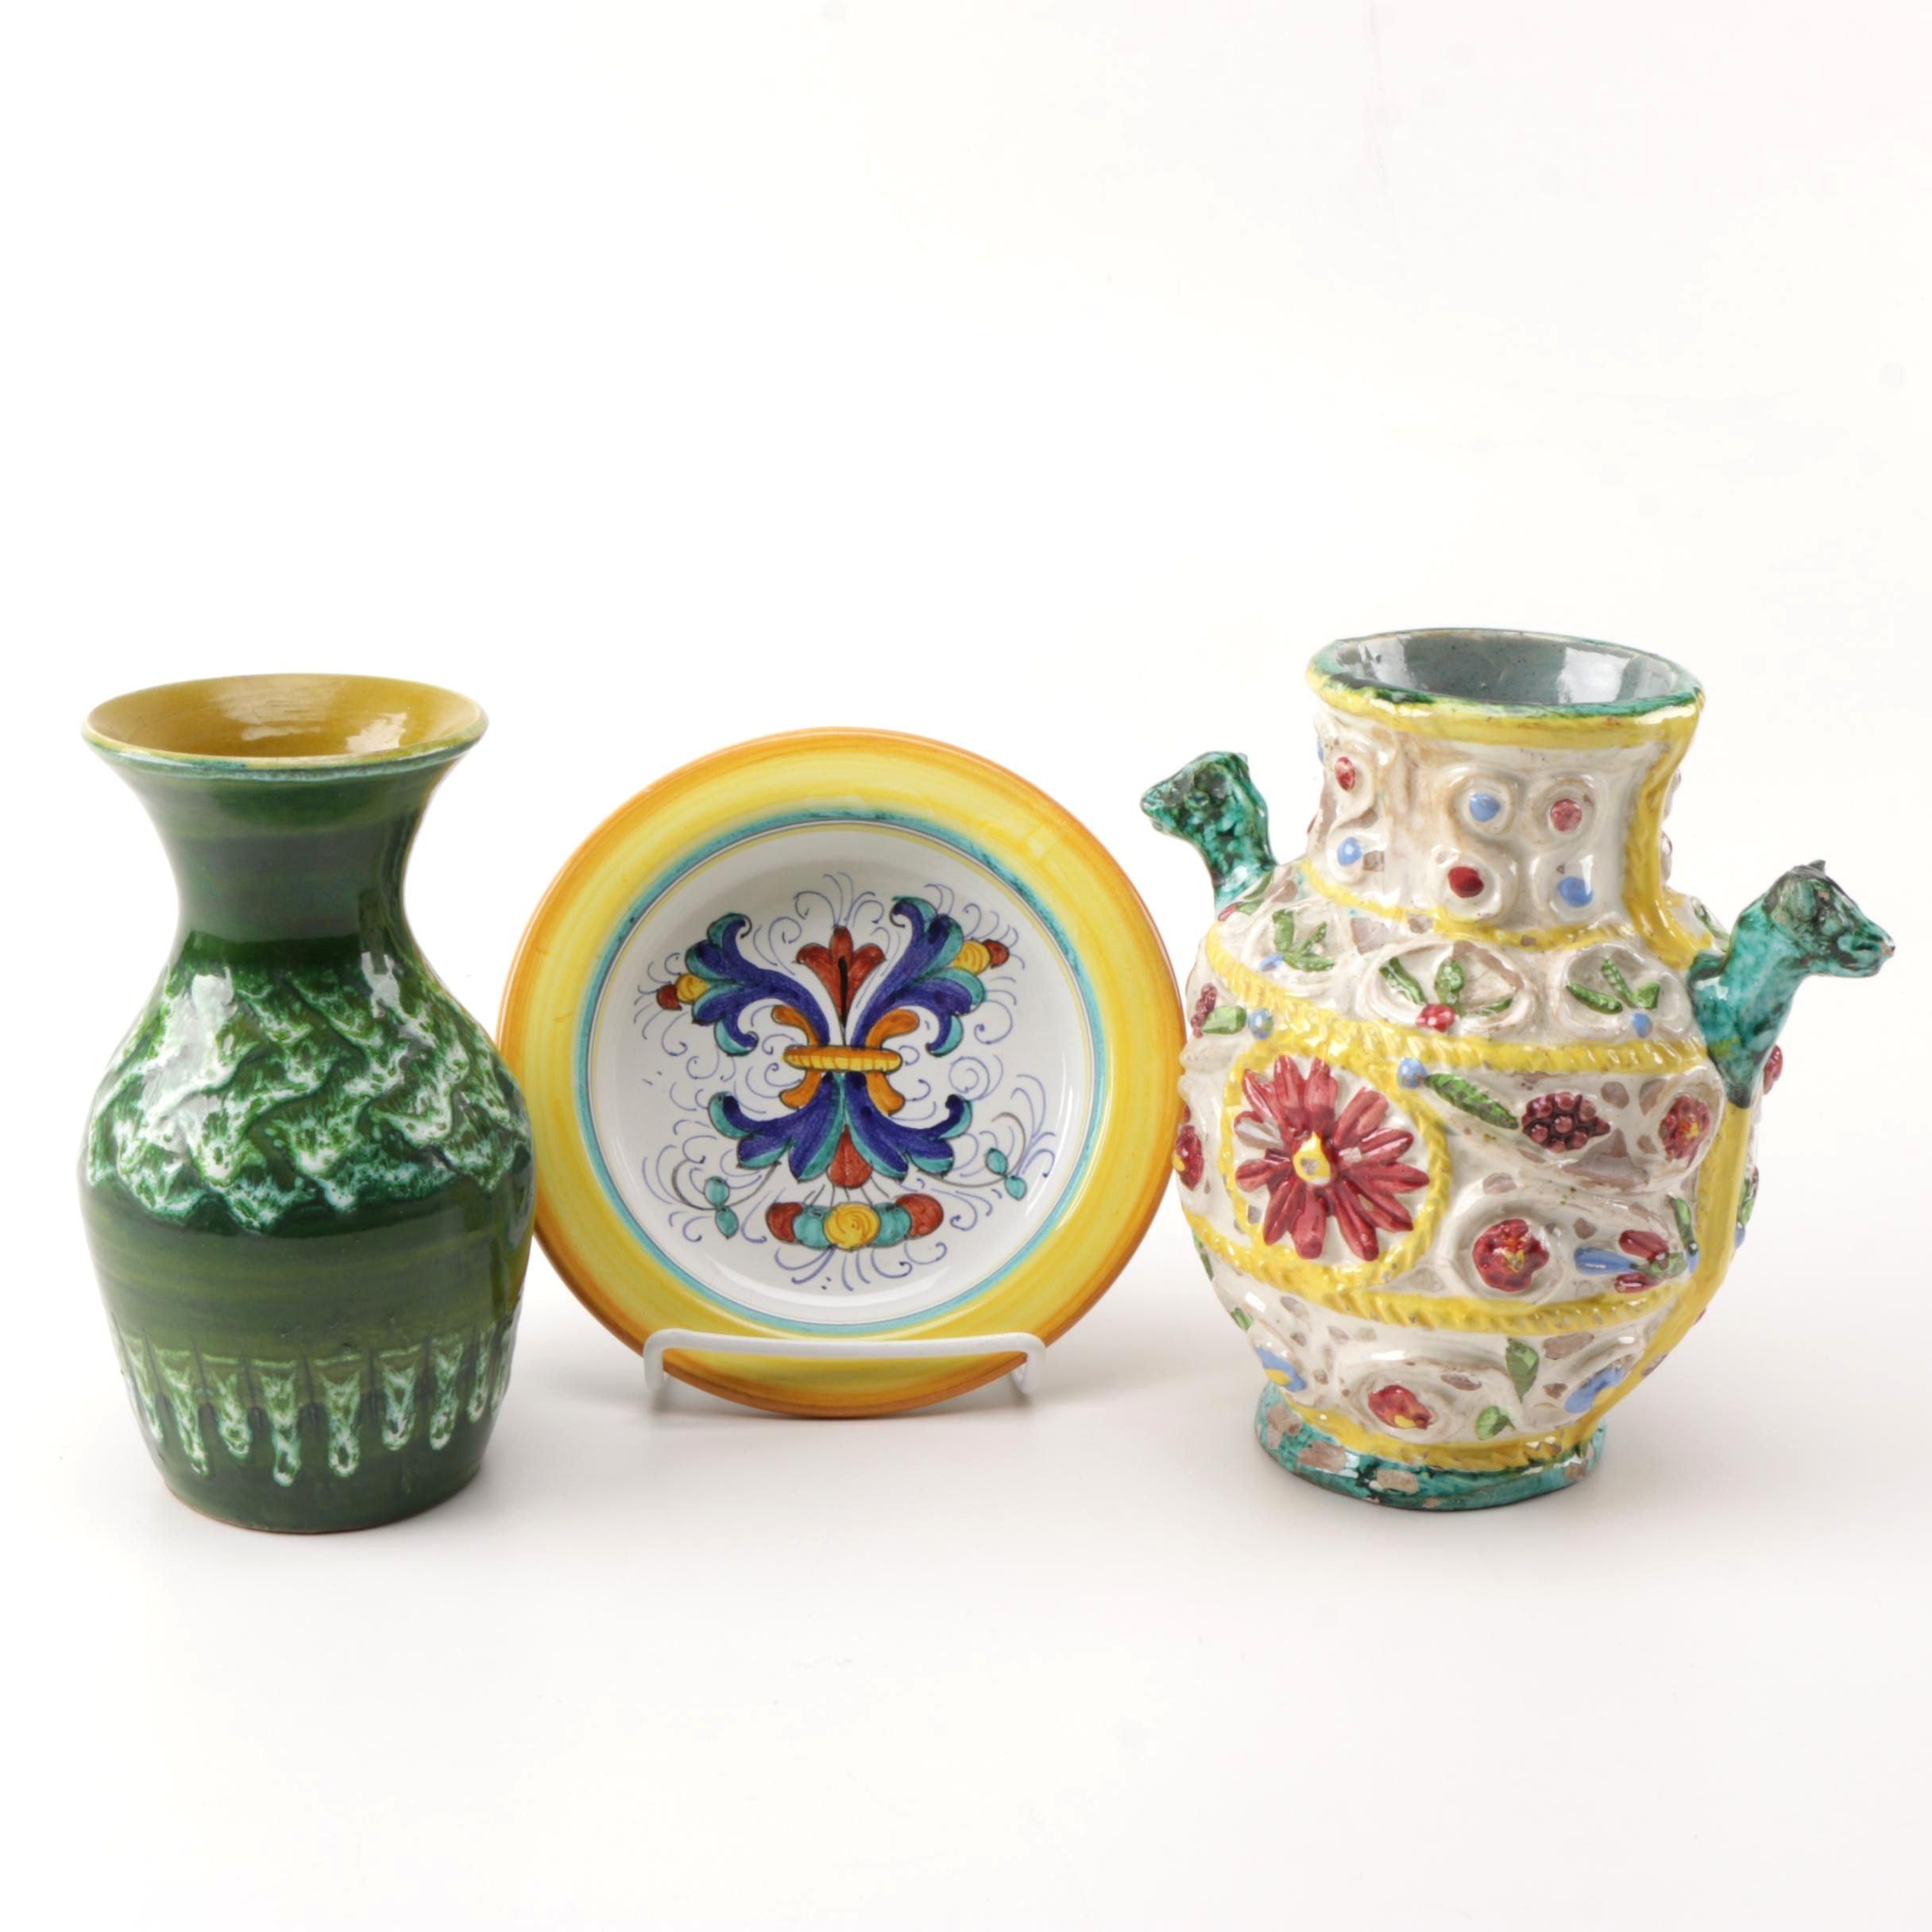 Collection of Italian Handmade Pottery